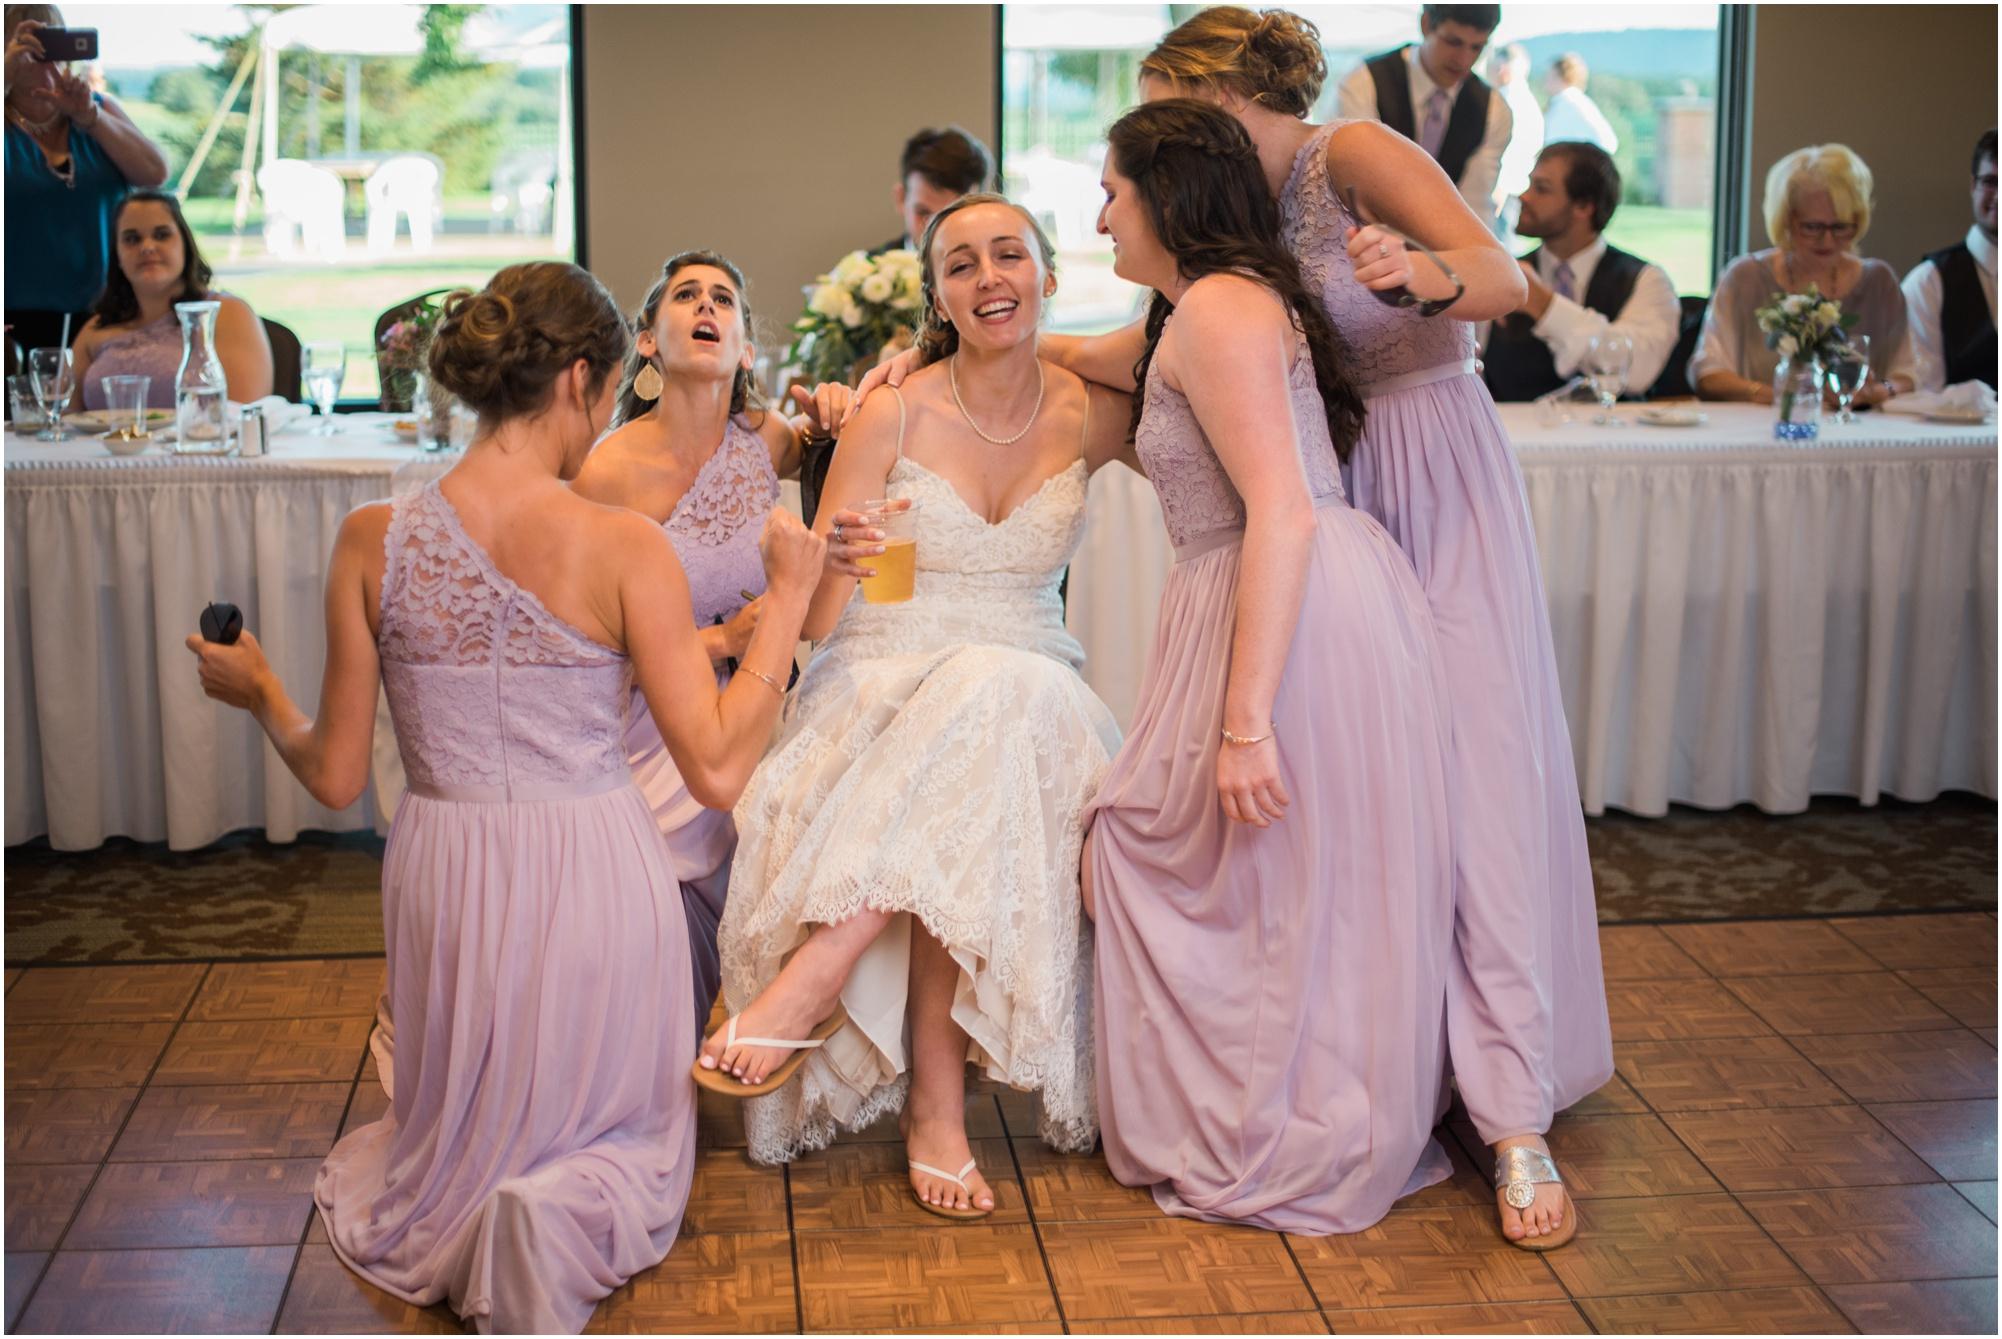 Wisconsin-Wedding-Photographer-Reedsburg-Country-Club-Kaela-and Matt-Wedding-807.jpg